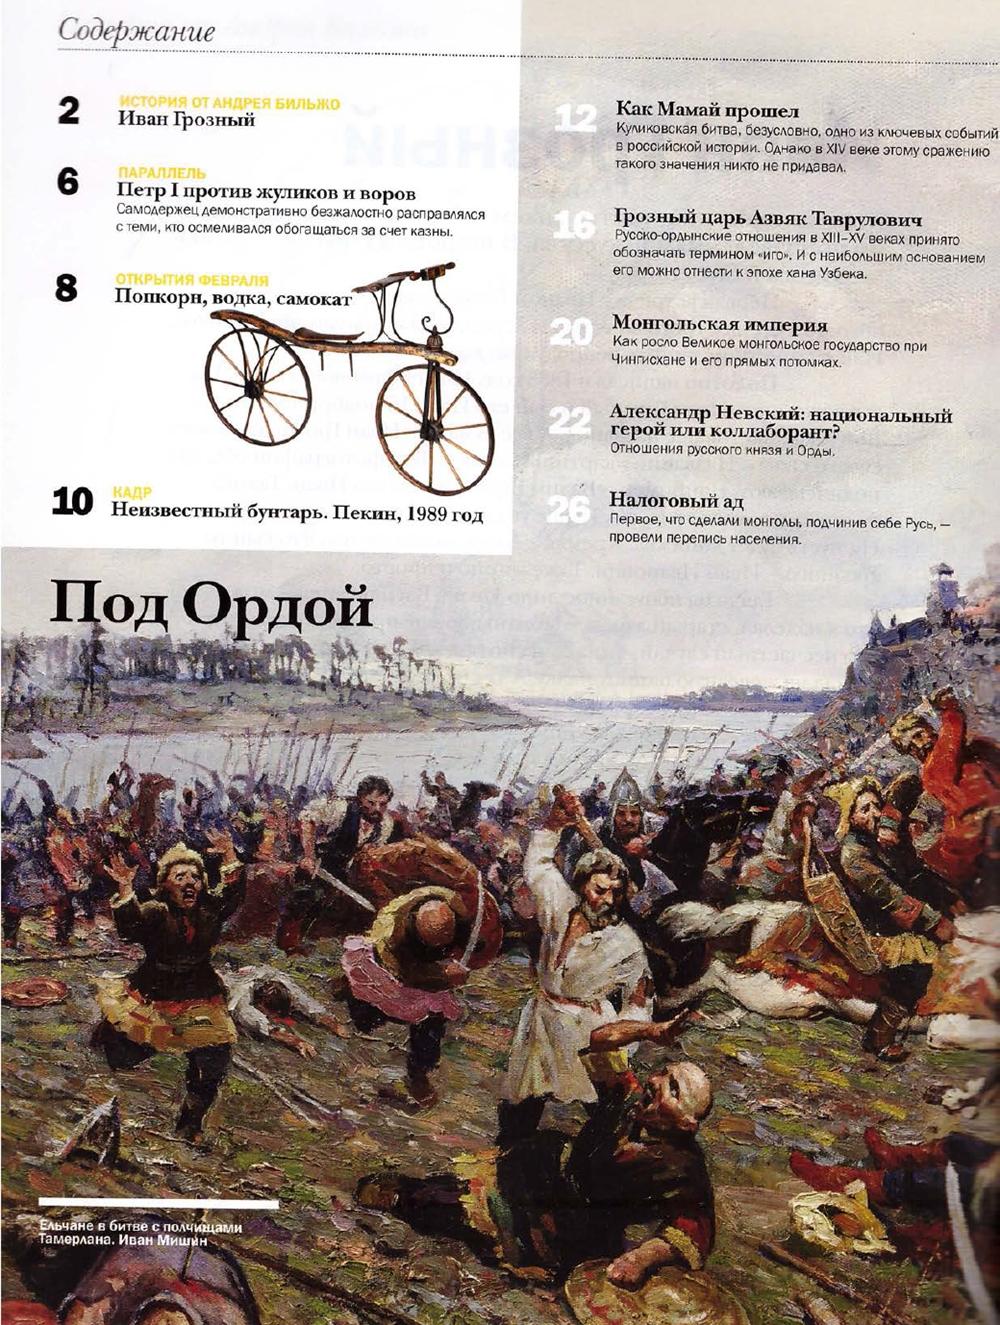 http://images.vfl.ru/ii/1404418786/9c1c971a/5616482.jpg